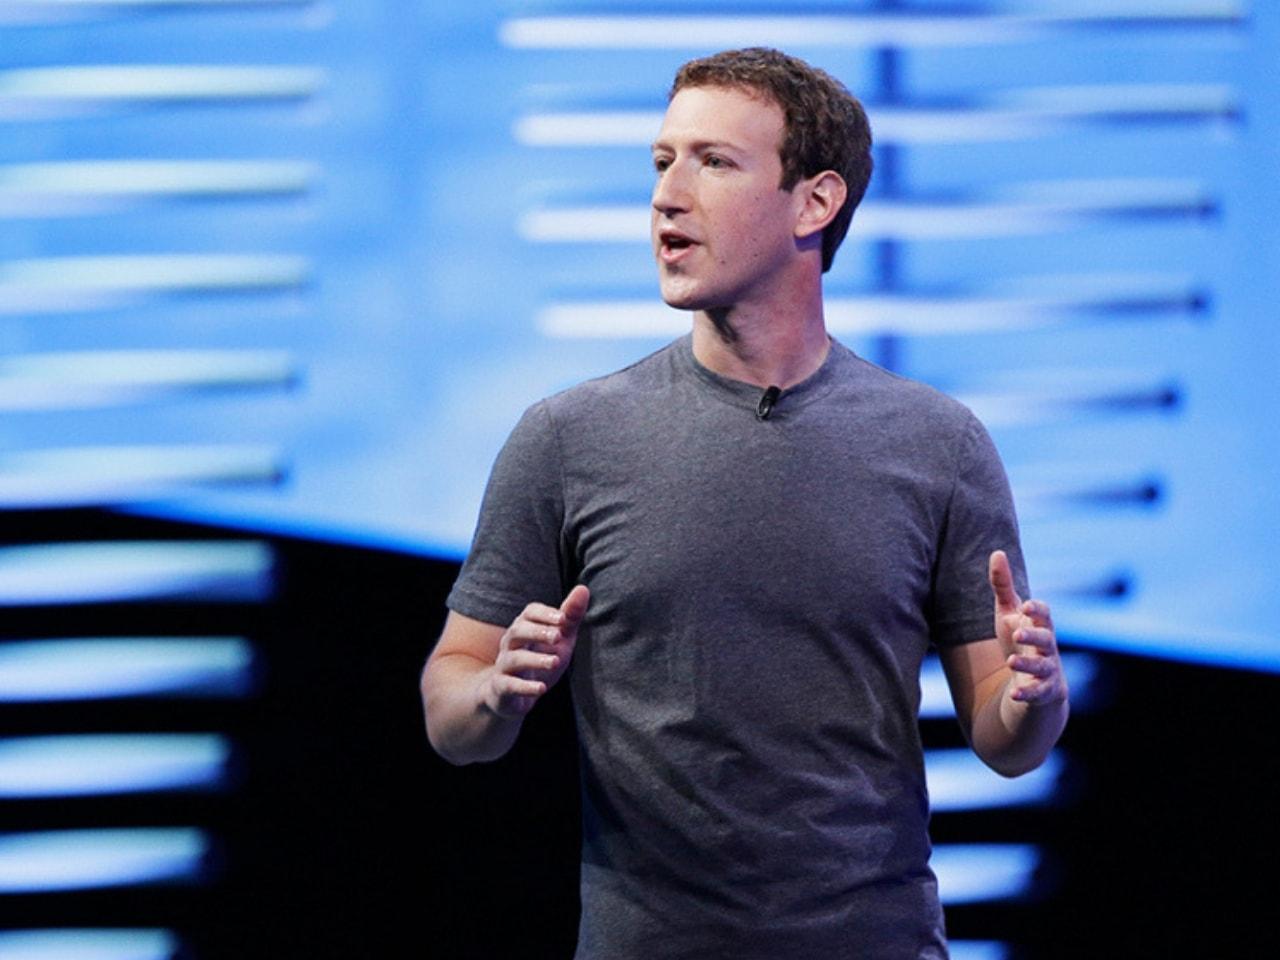 Zuckerberg F8